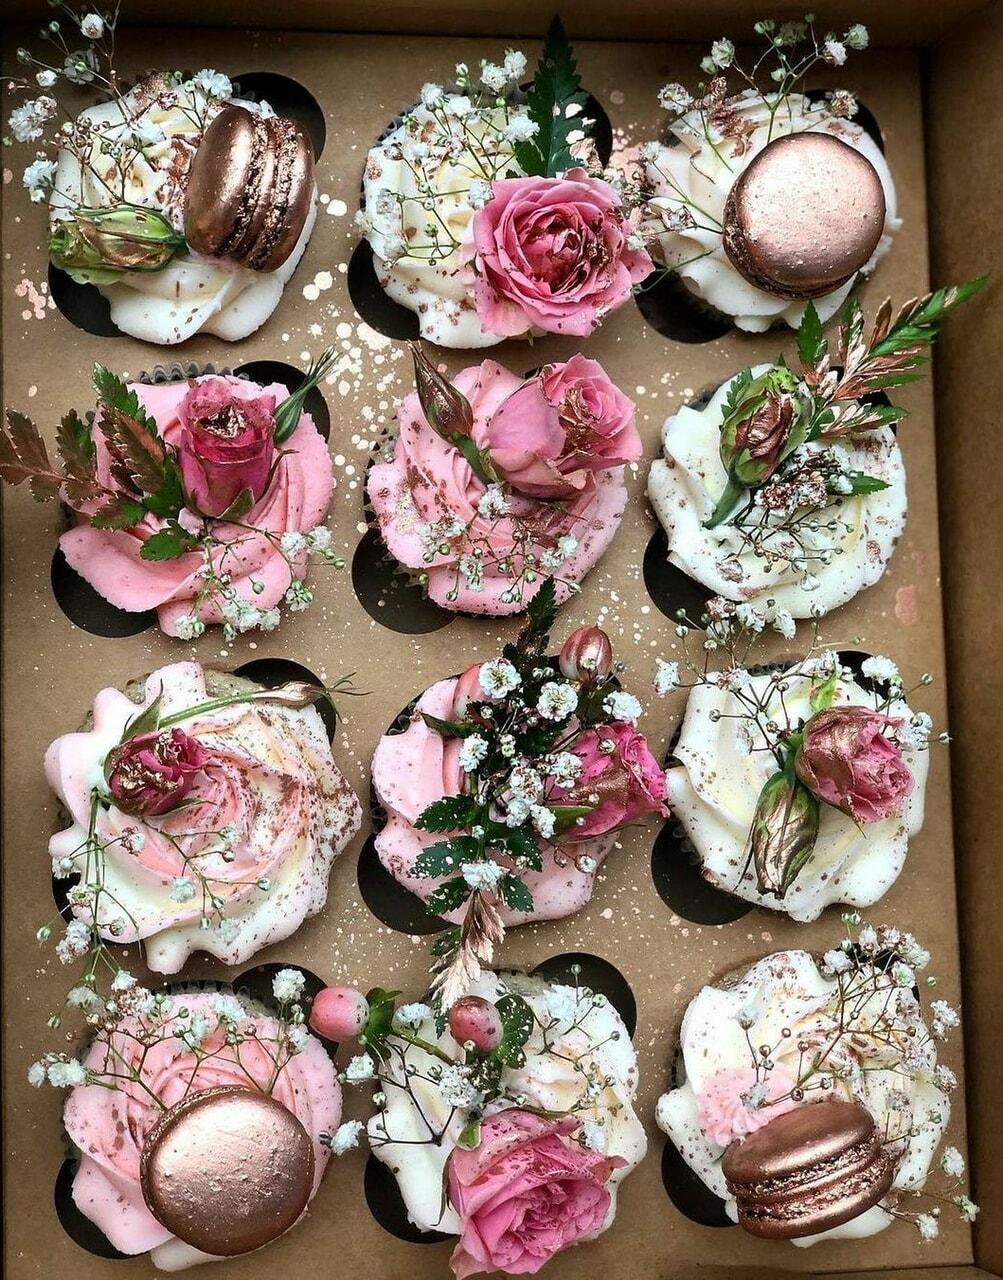 aesthetic, foodie, and wedding image